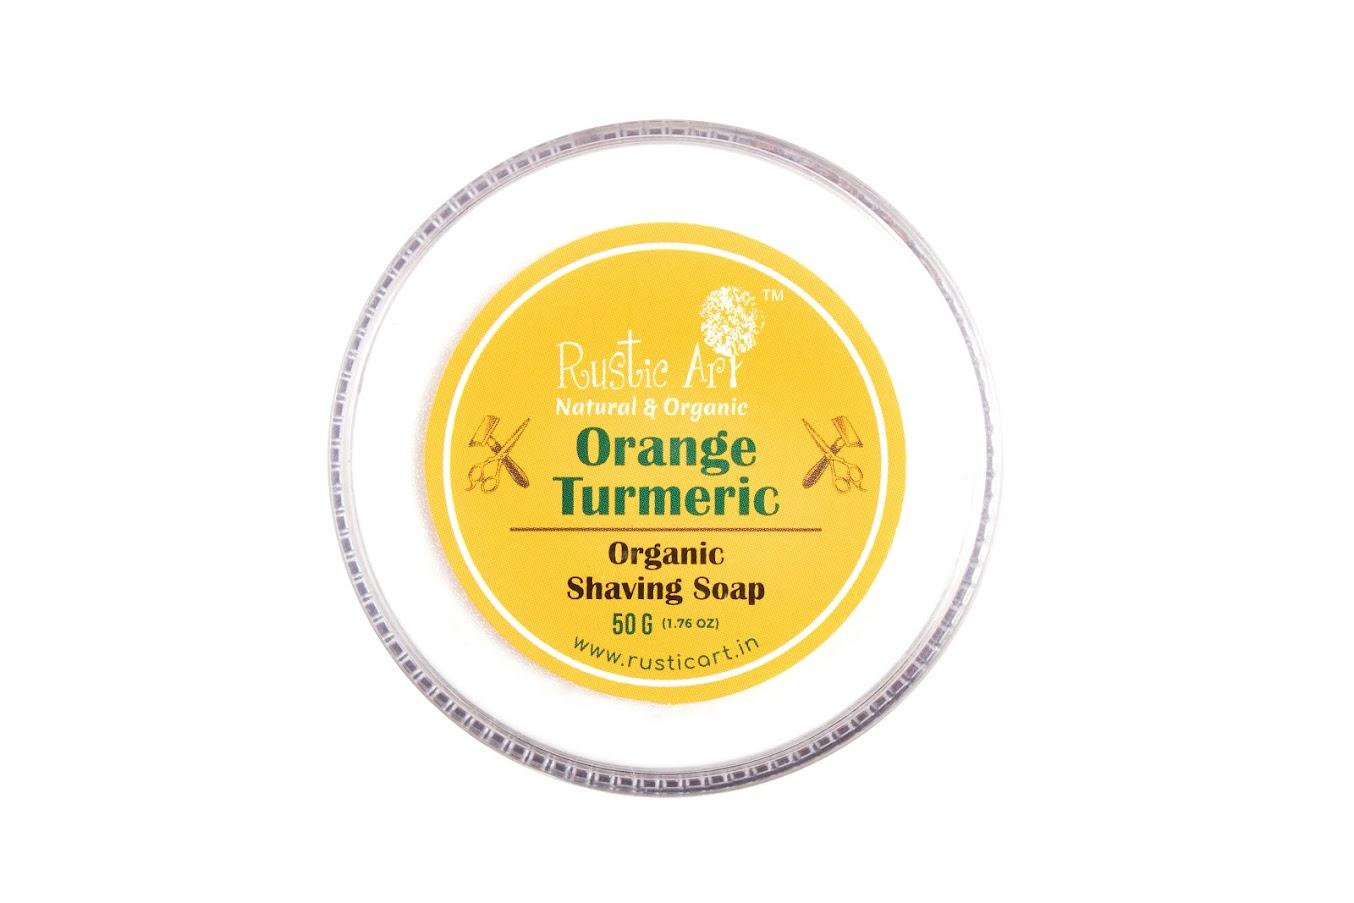 Rustic Art Orange Turmeric Shaving Soap